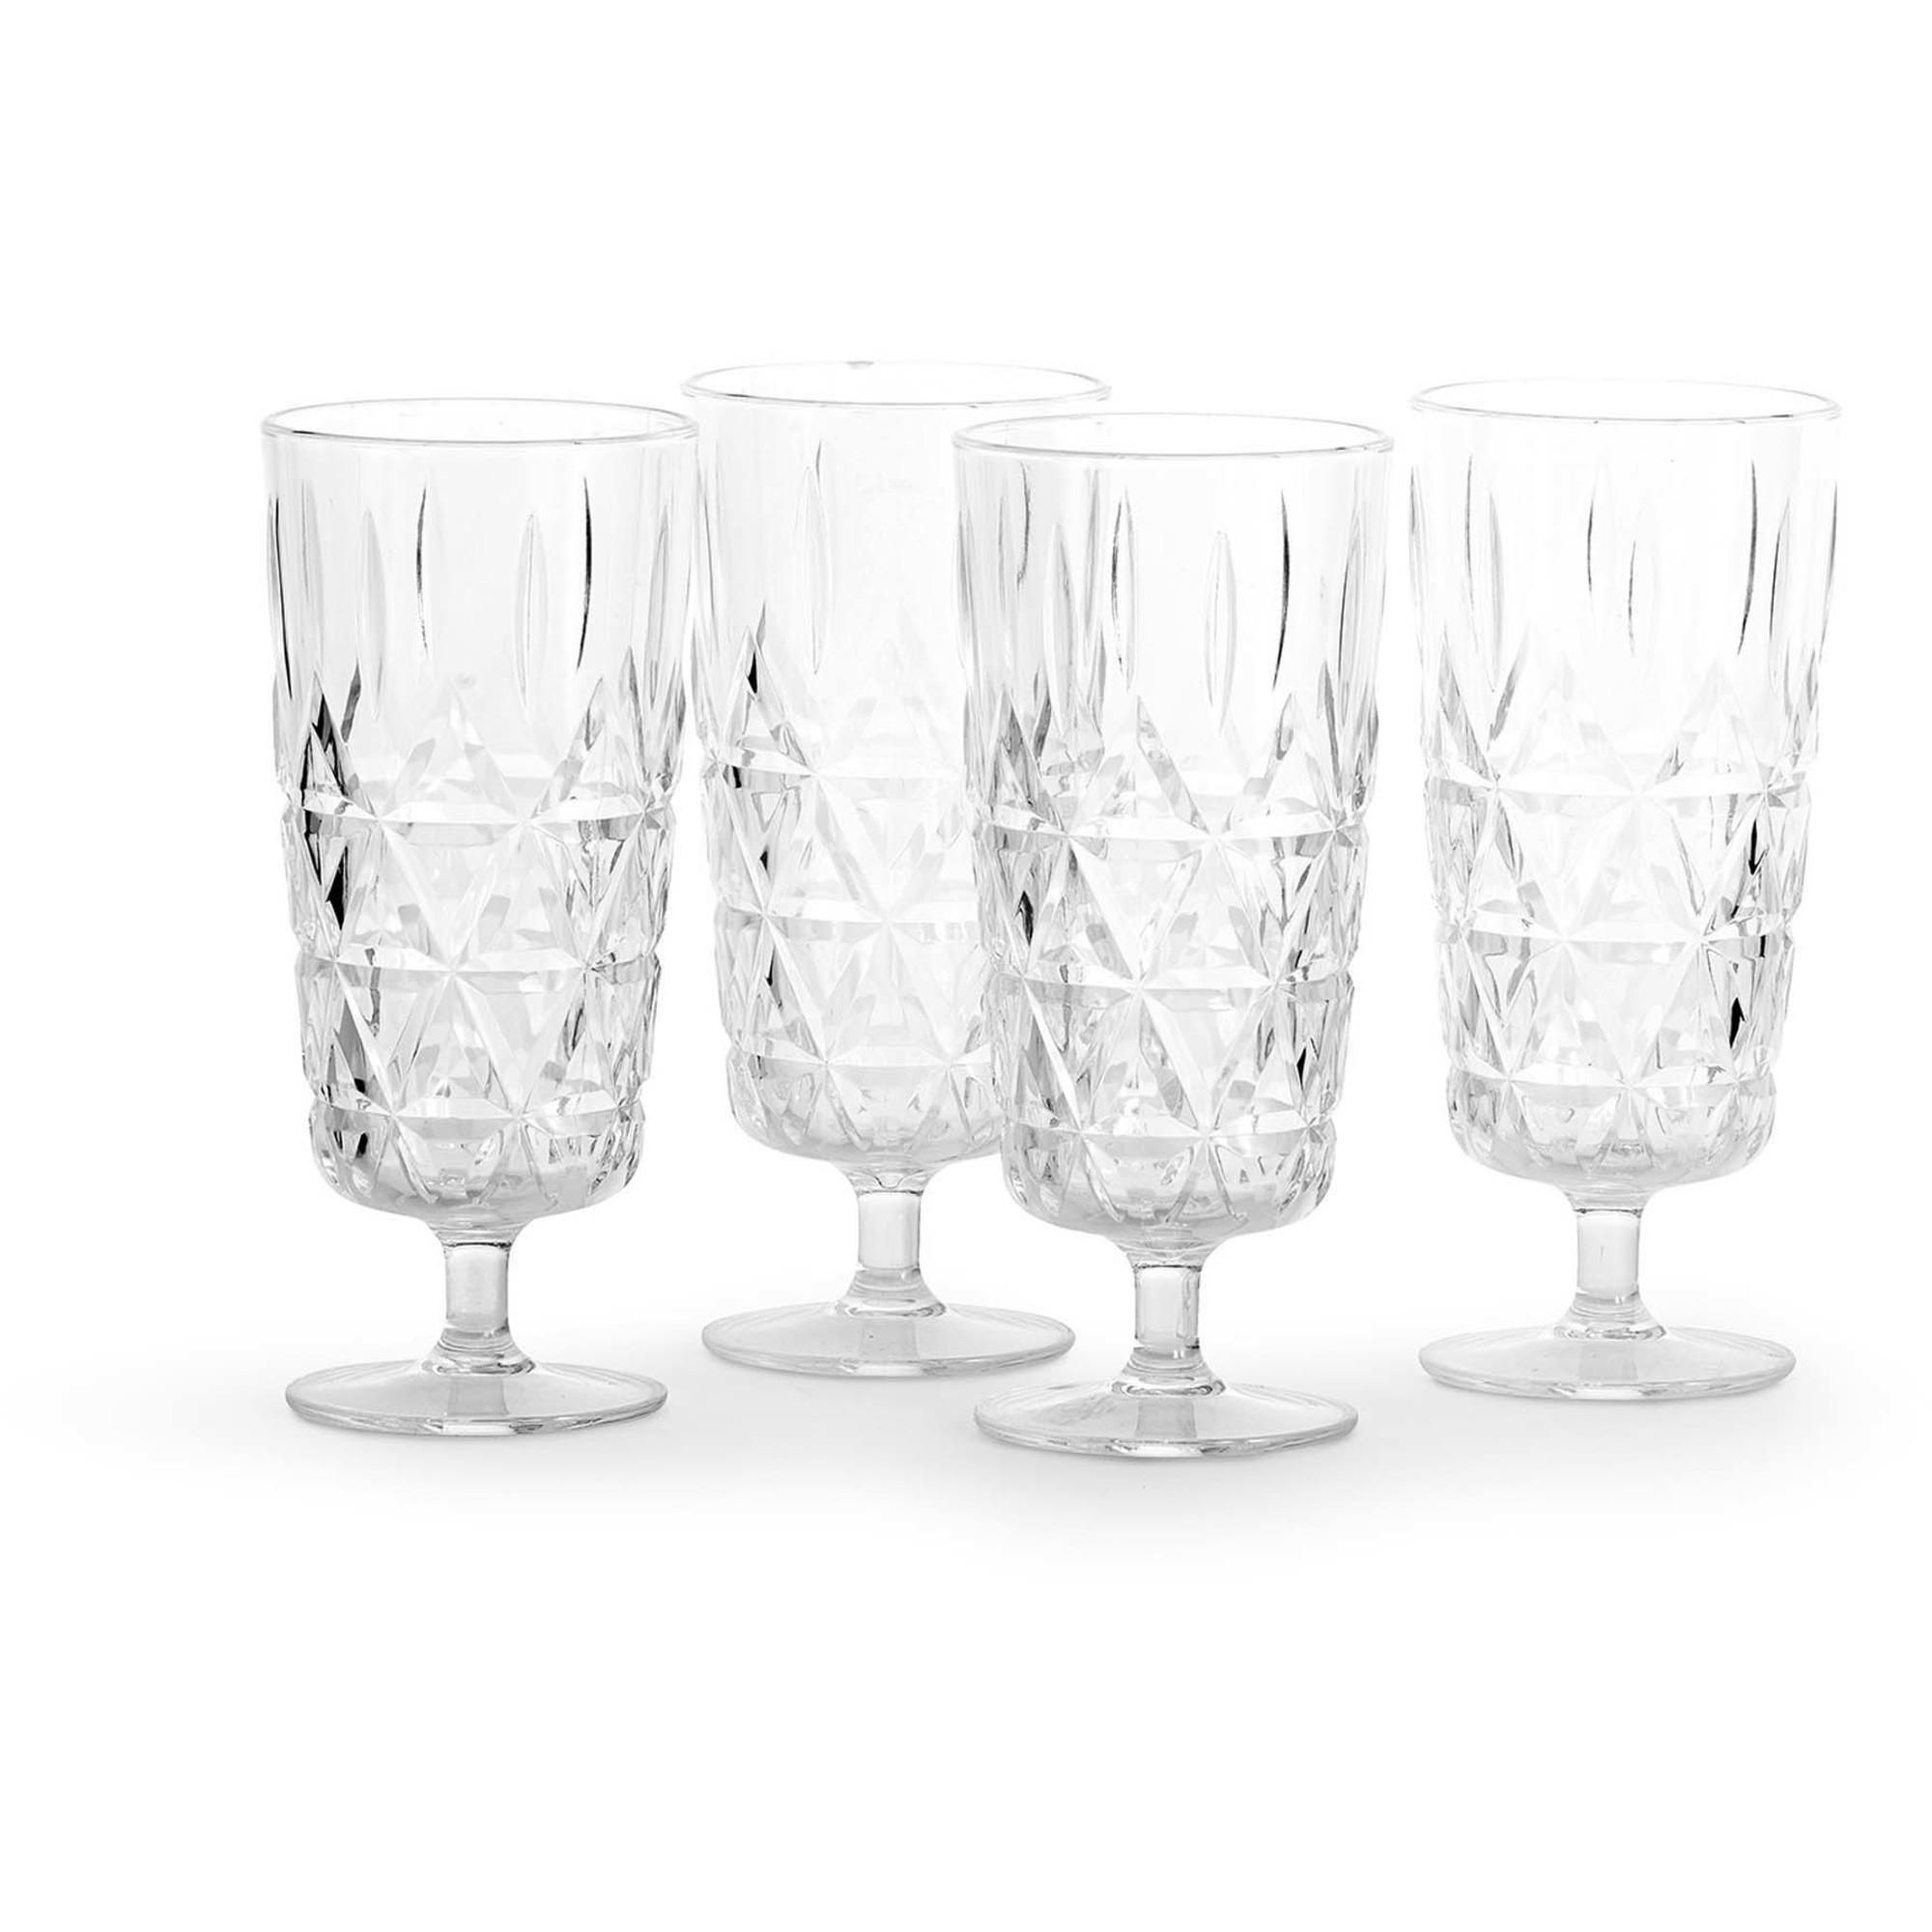 Sagaform Picnic champagne glas 4-pack